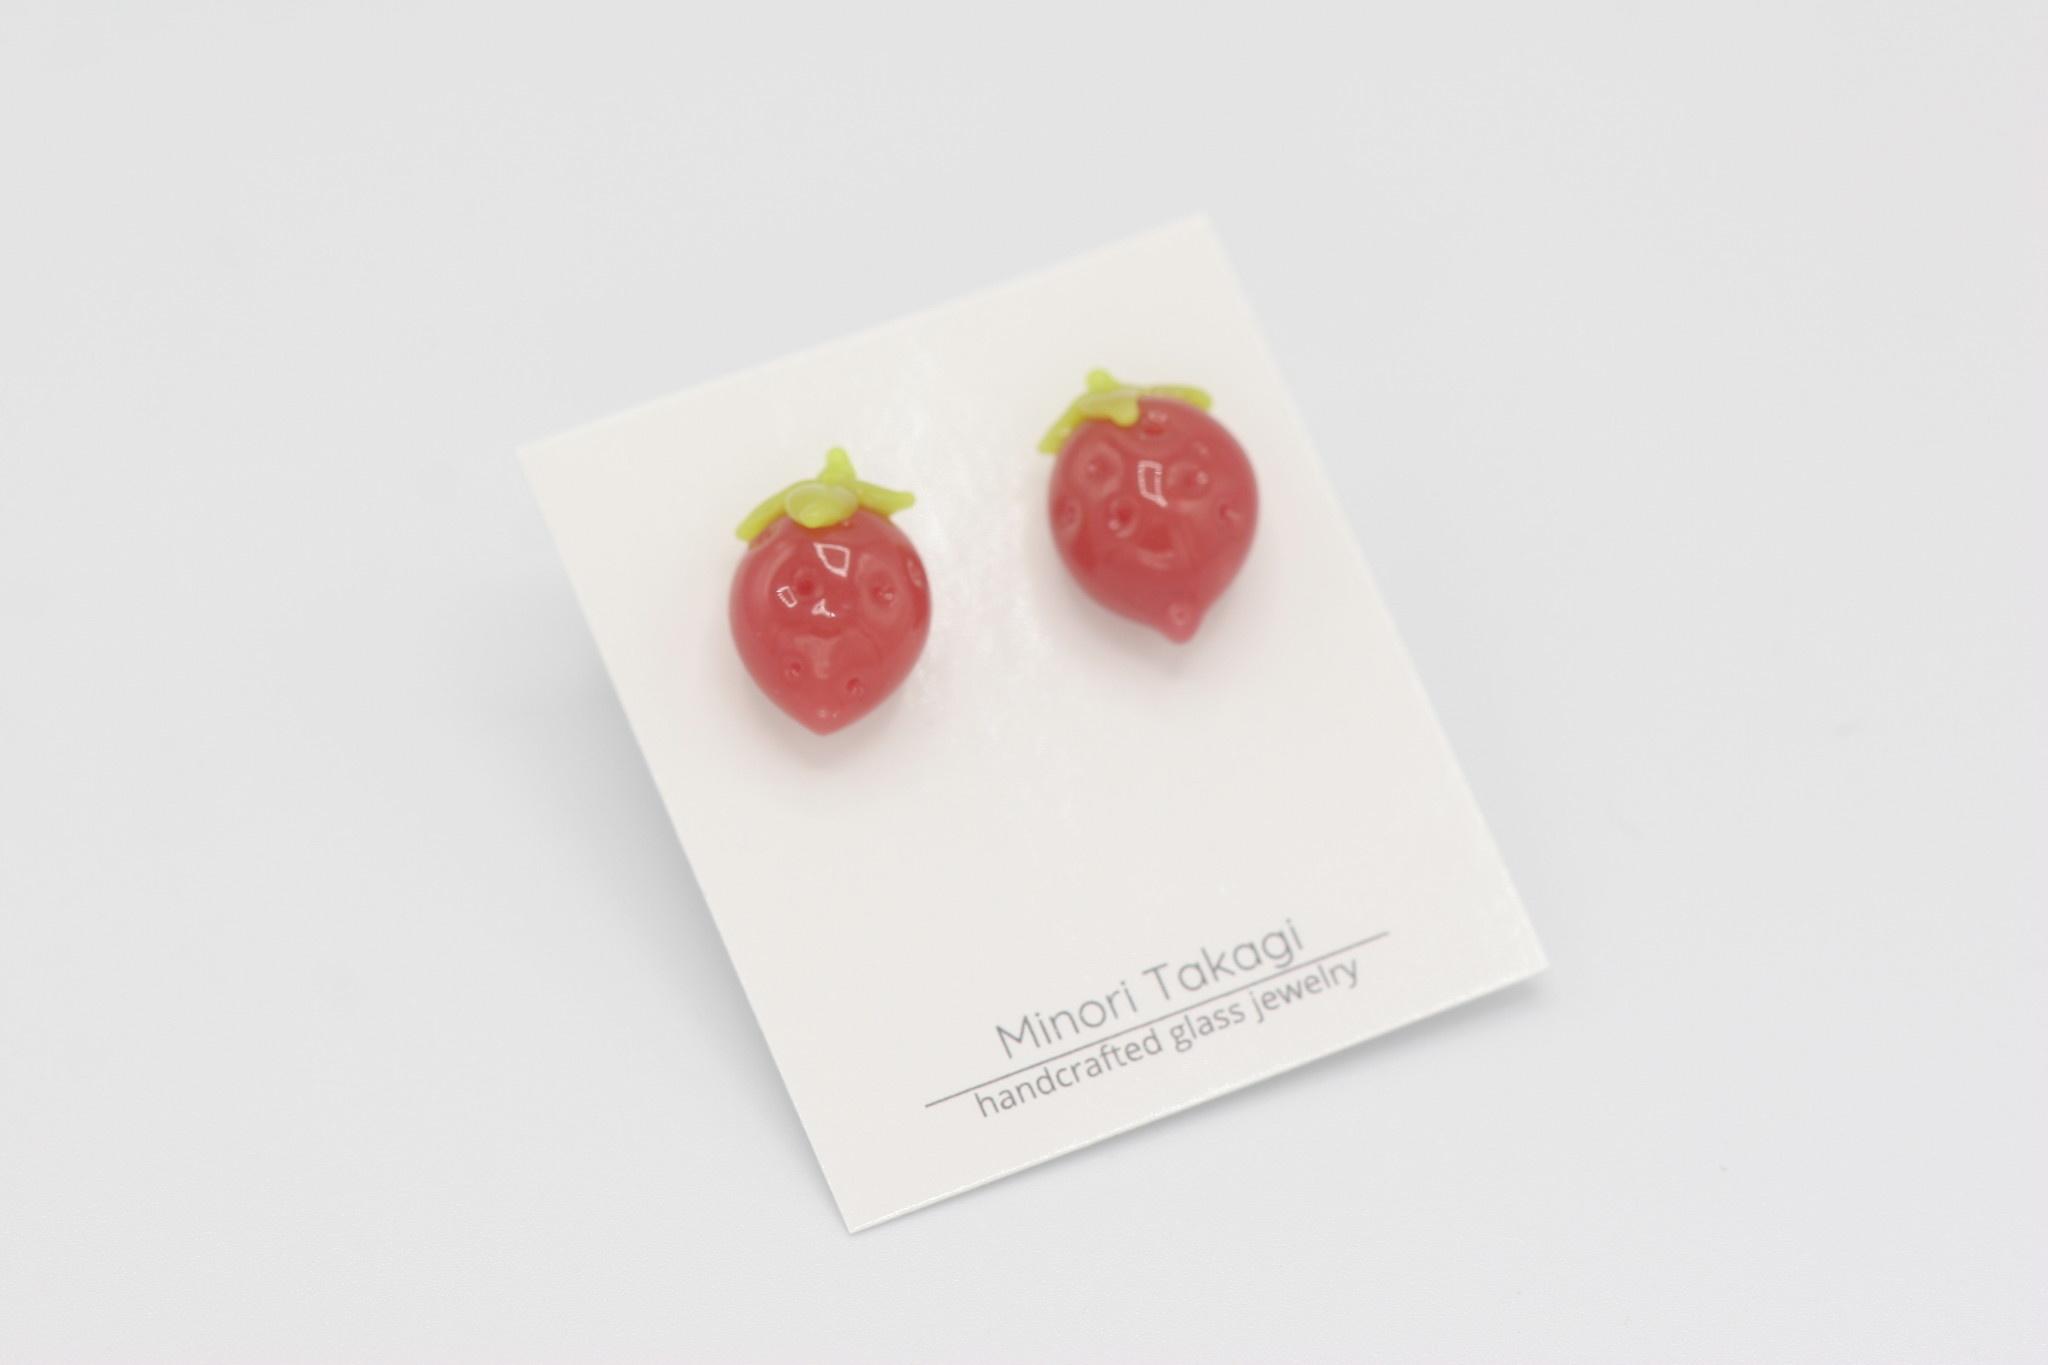 Minori Takagi Earrings - Strawberry Pink